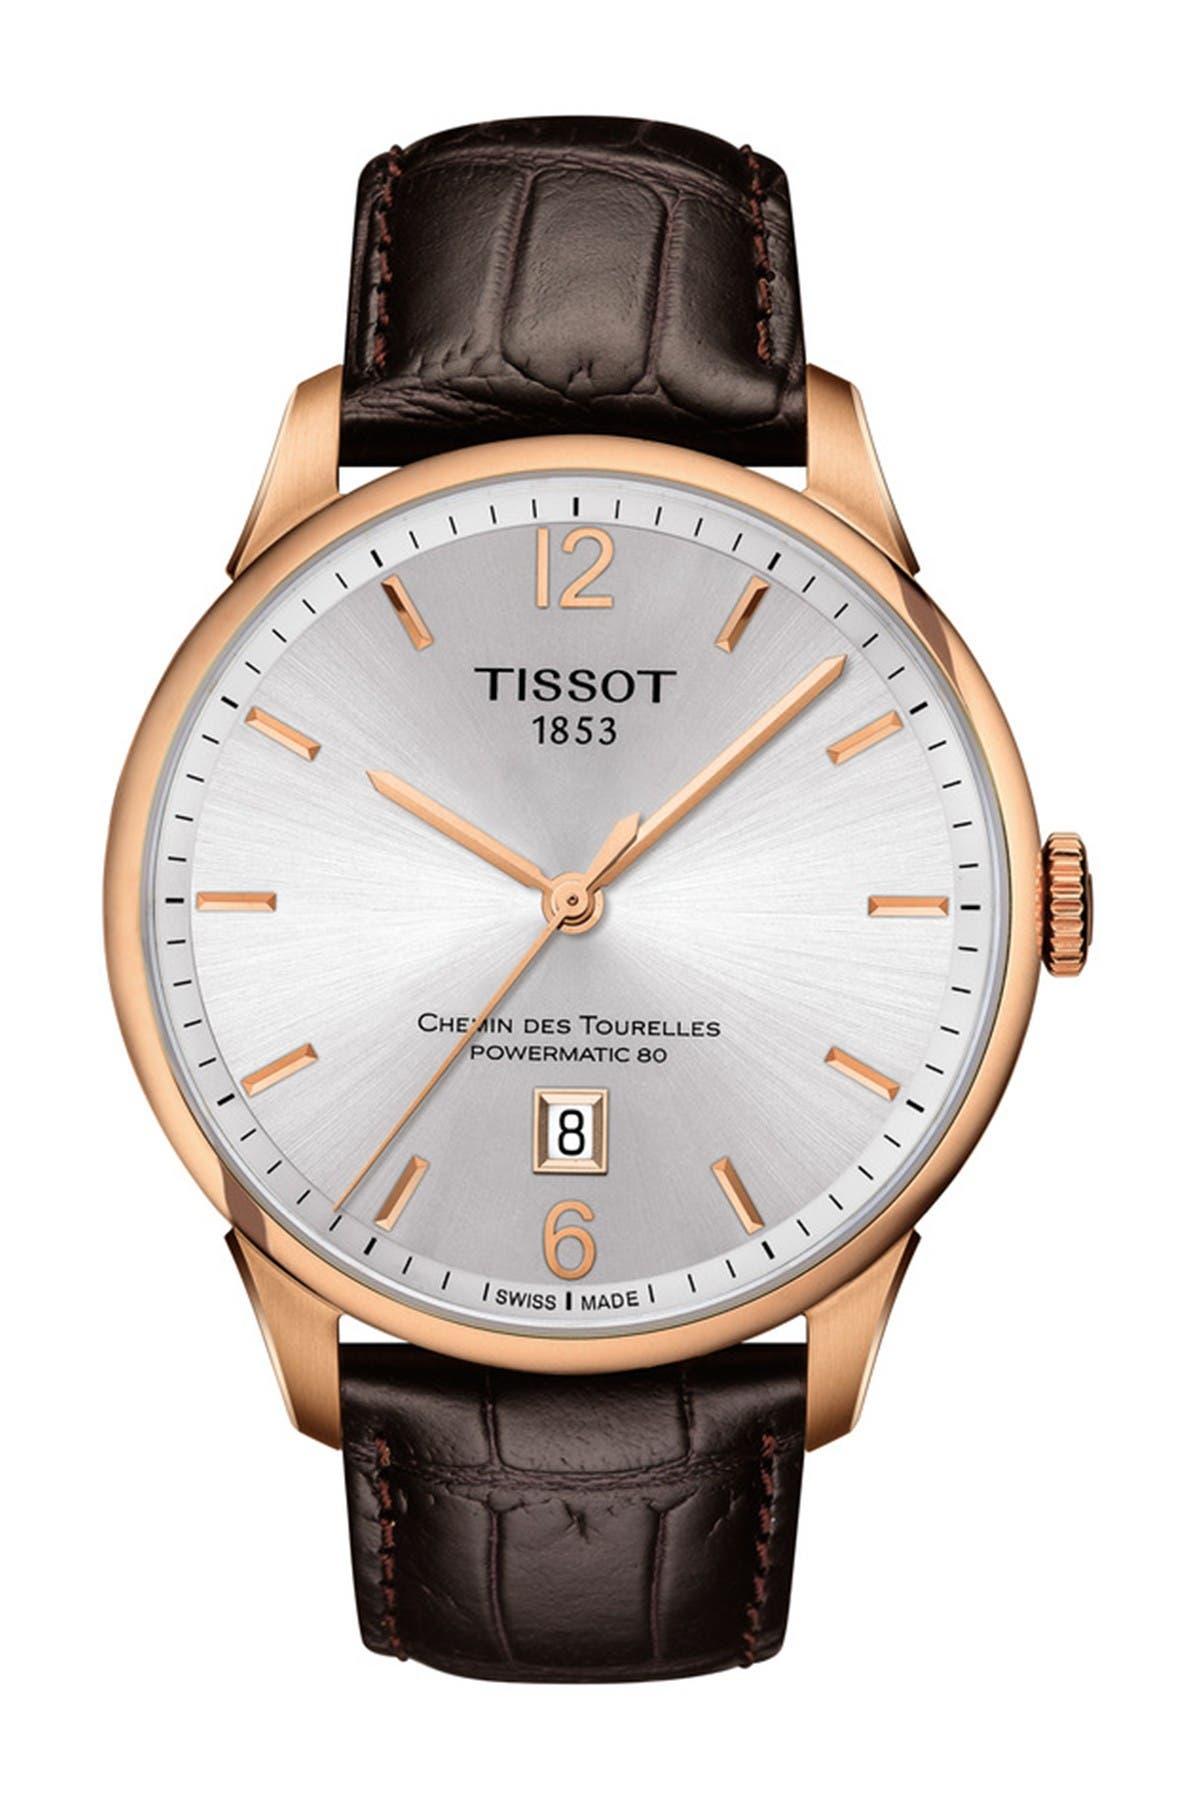 Image of Tissot Men's Chemin des Tourelles Powermatic 80 Croc Embossed Leather Strap Watch, 42mm